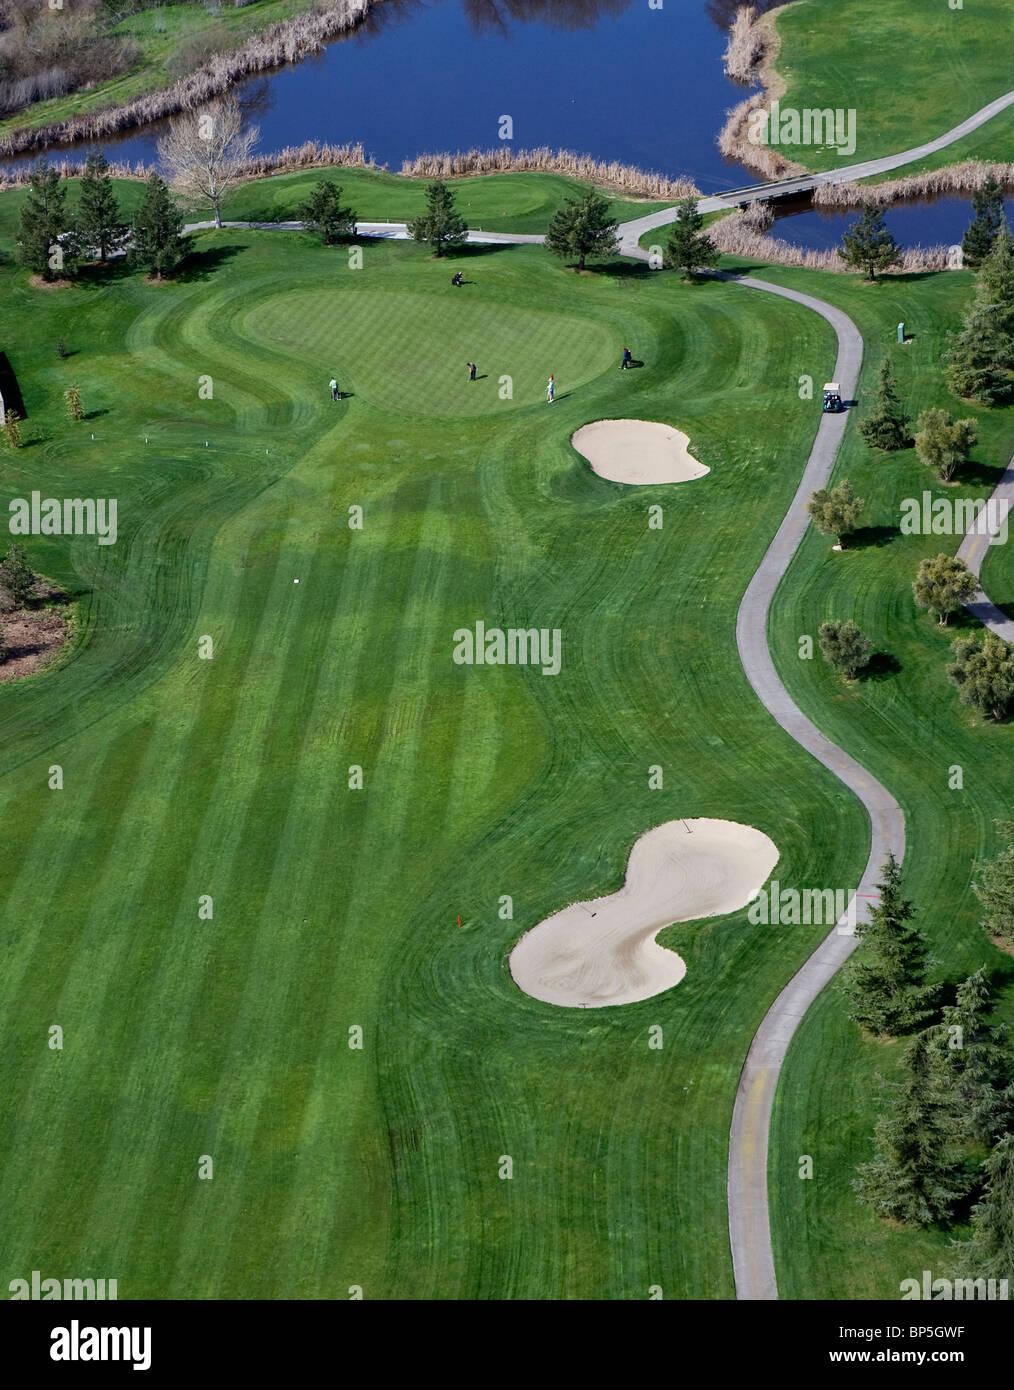 Golf Course Clubhouse Interior Design Ideas: Rooster Run, Petaluma, California